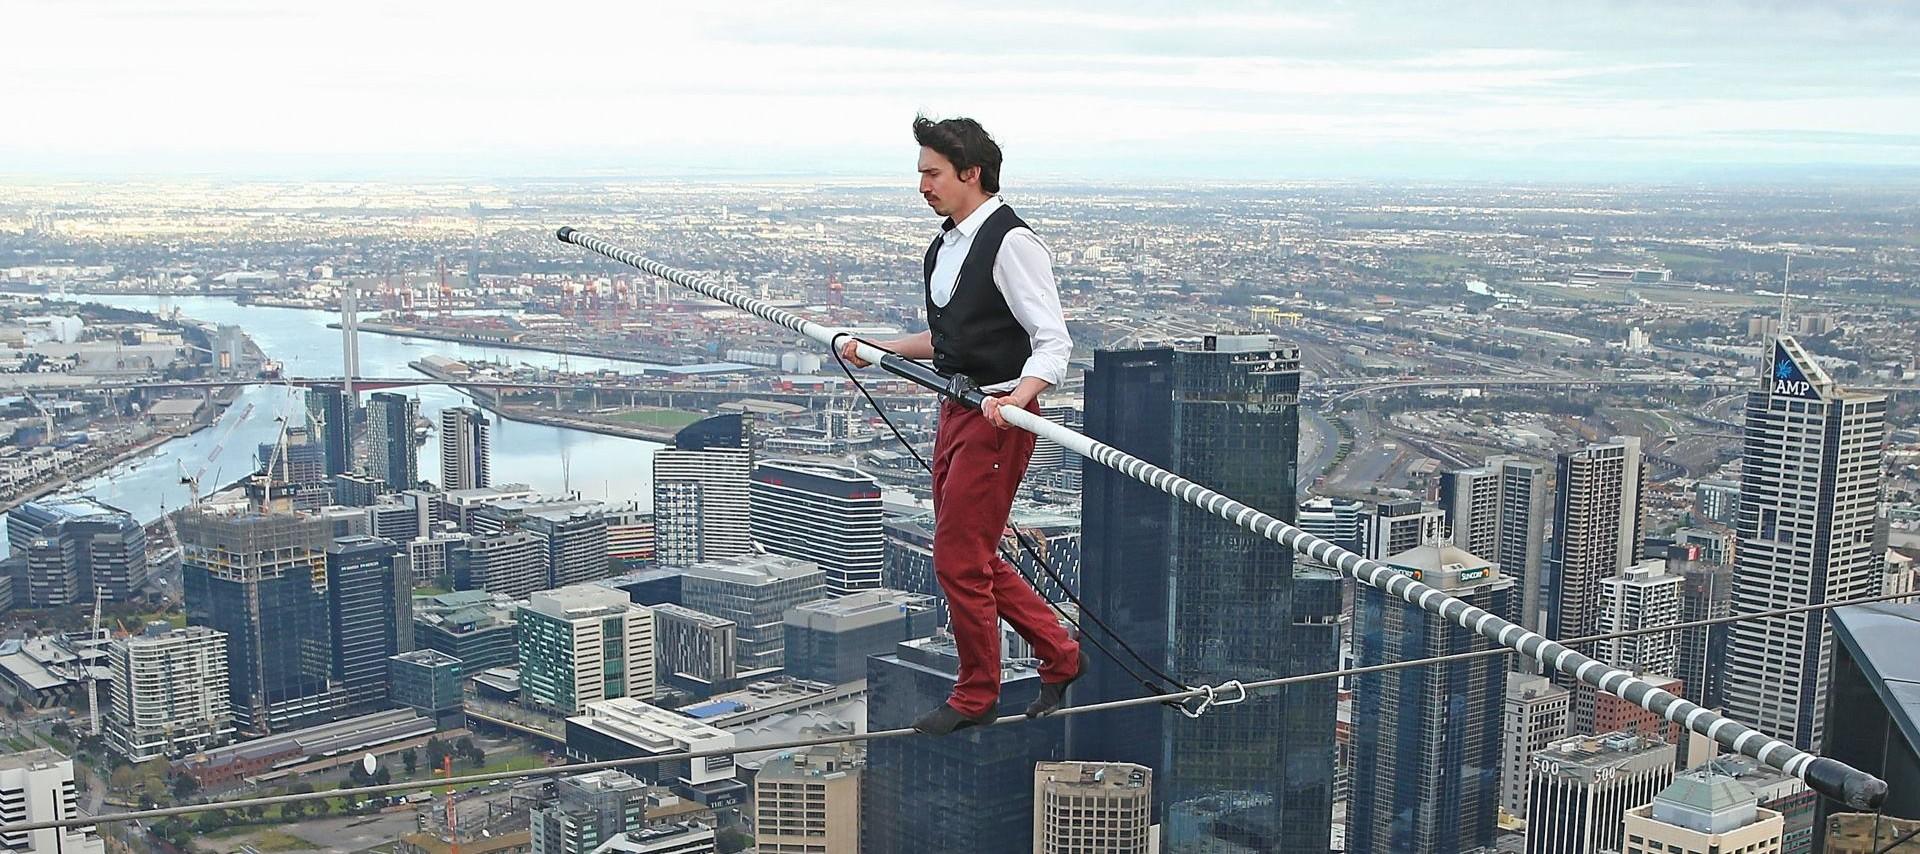 VIDEO: Kane Petersen hodao po žici između nebodera na 300 metara visine